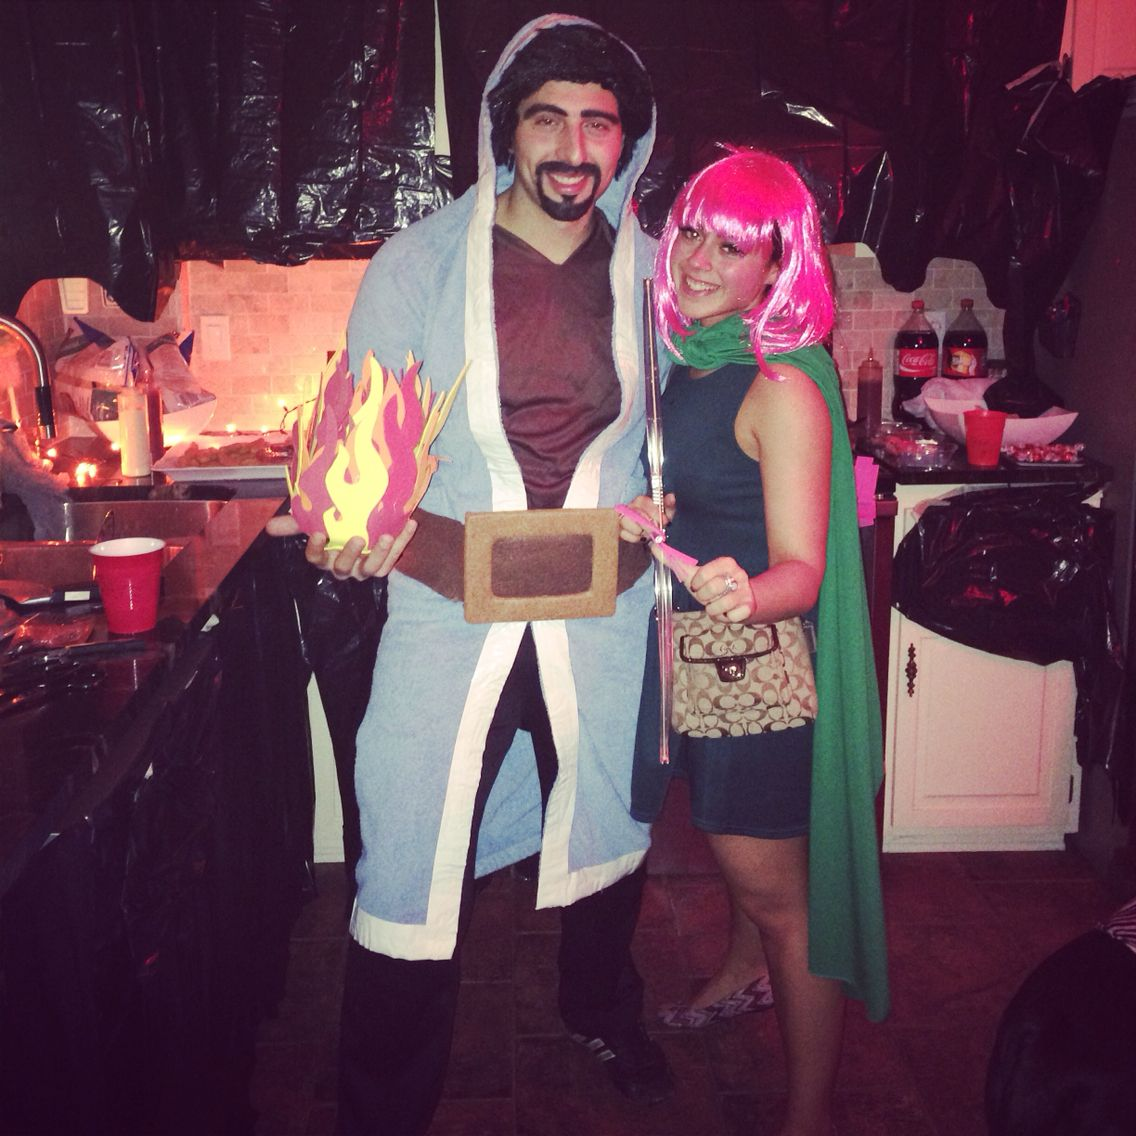 Clash of clans costume ! #clashofclans #diy | DIY | Pinterest ...